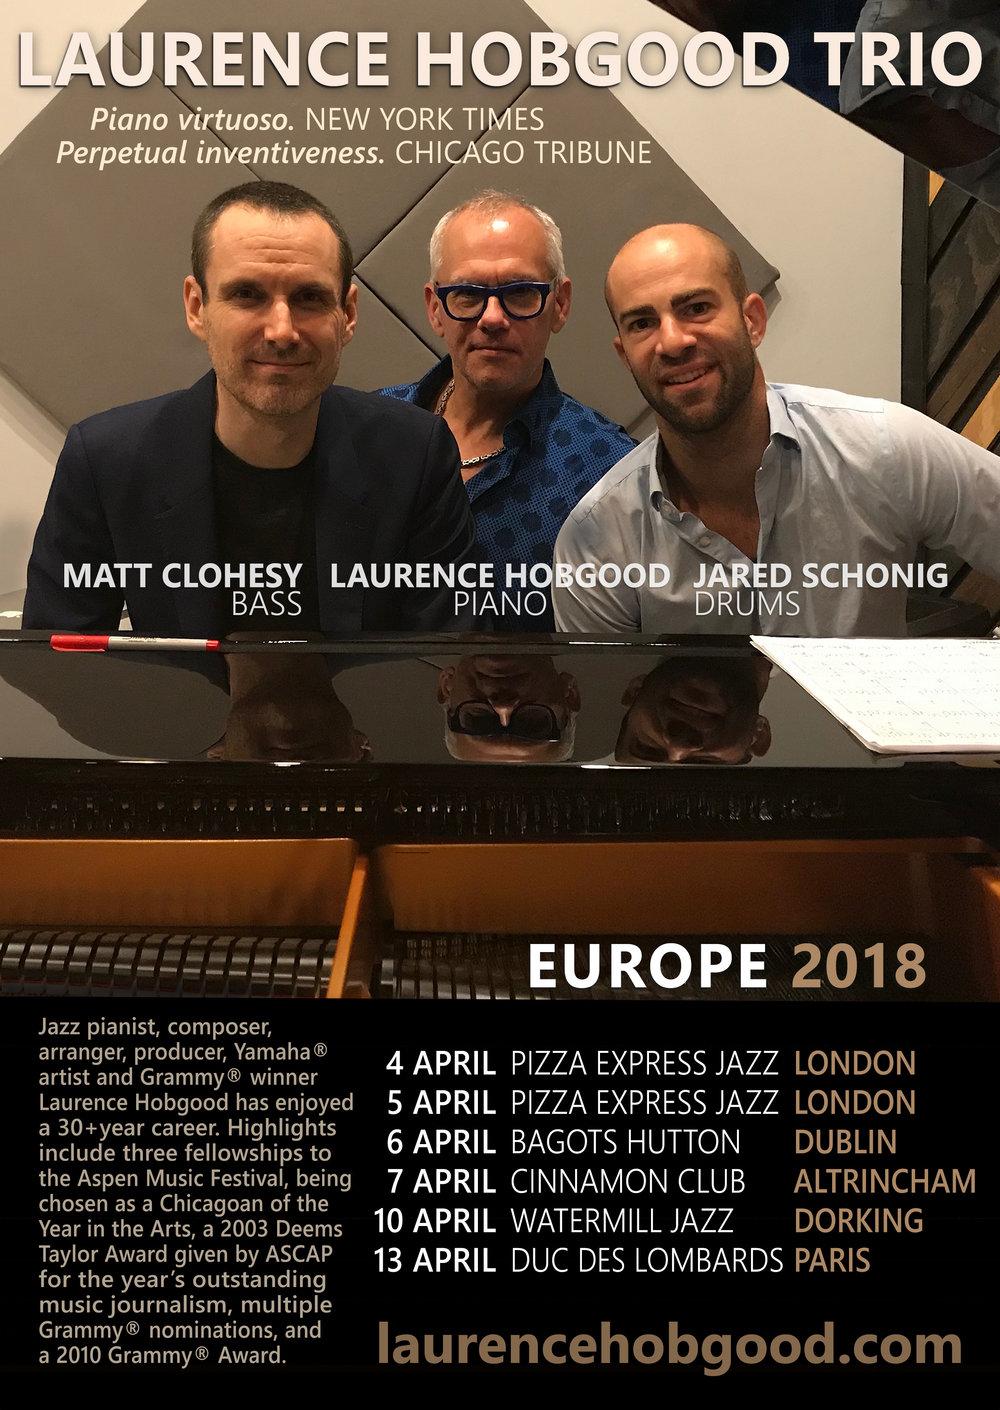 hobgood trio europe poster with bio.jpg